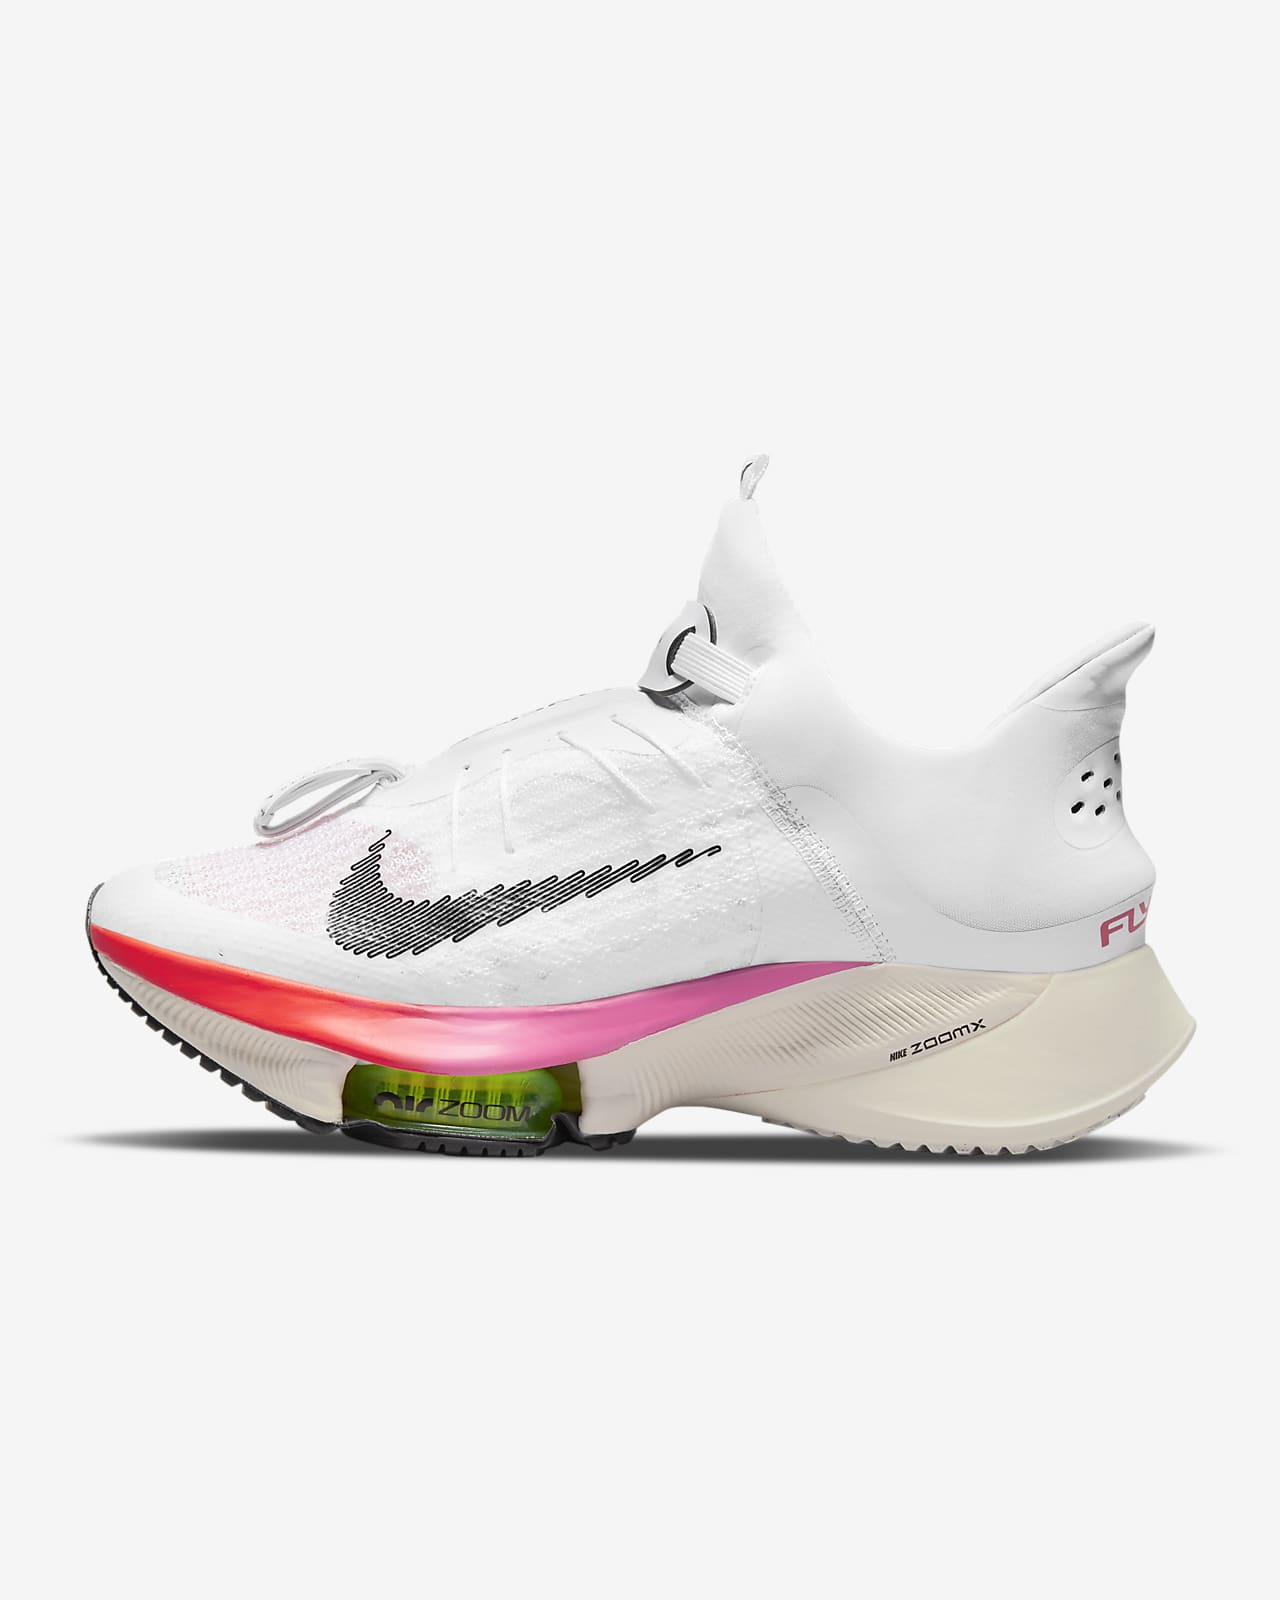 Scarpa da running su strada facile da indossare Nike Air Zoom Tempo Next% FlyEase - Donna